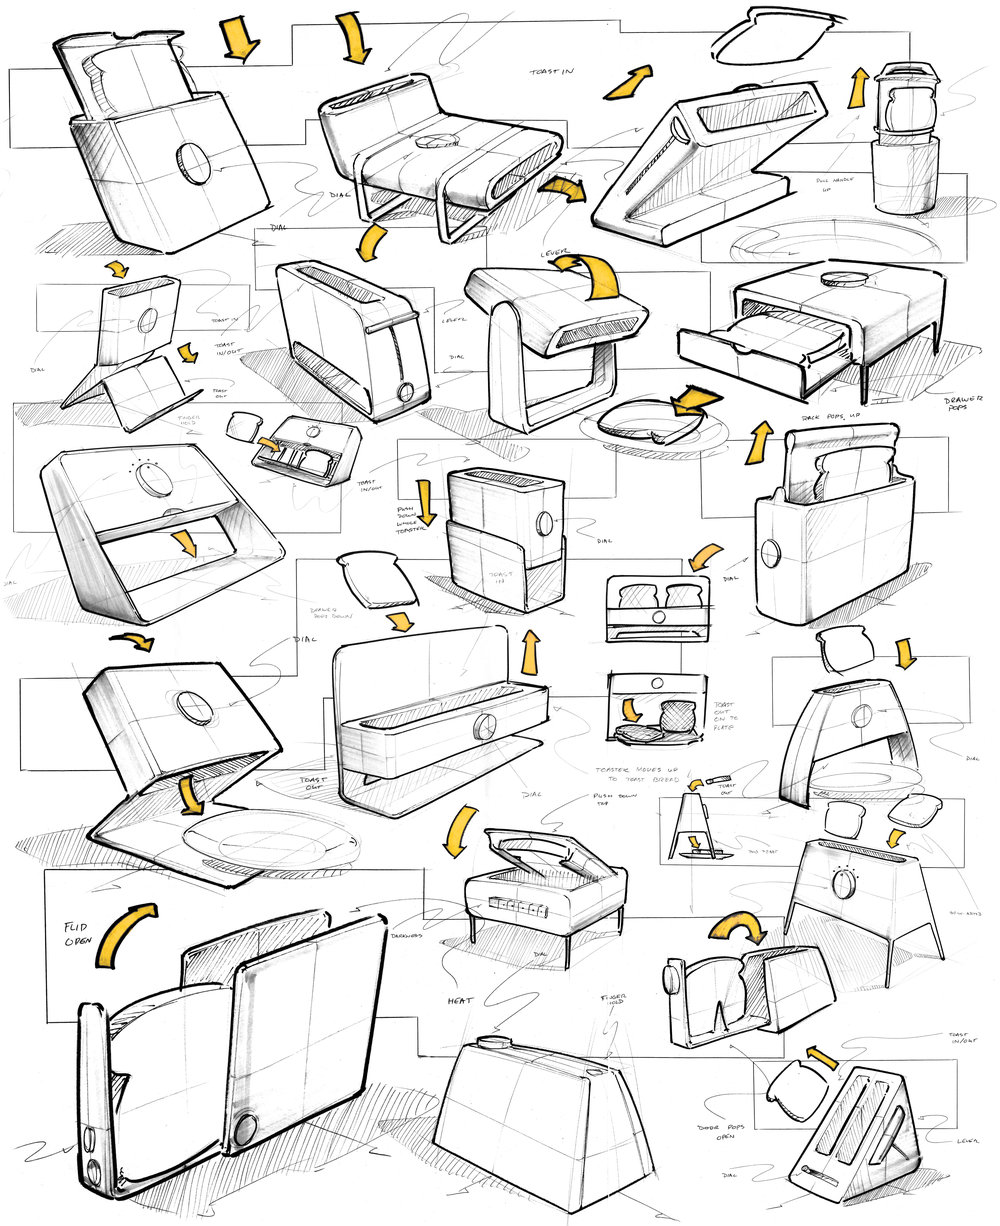 pivot-toaster-sketches-nicholas-baker